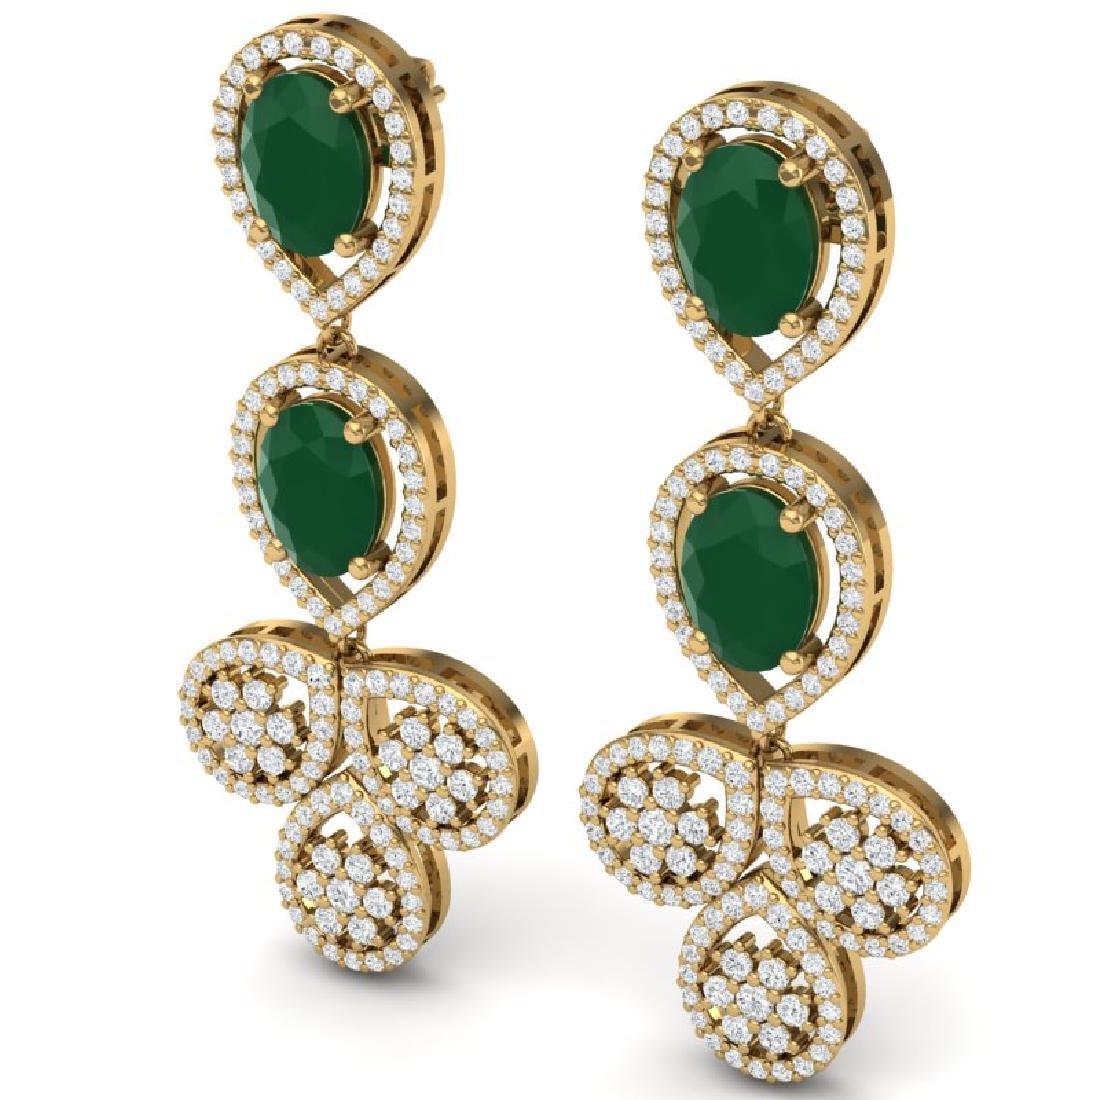 9.75 CTW Royalty Emerald & VS Diamond Earrings 18K - 2